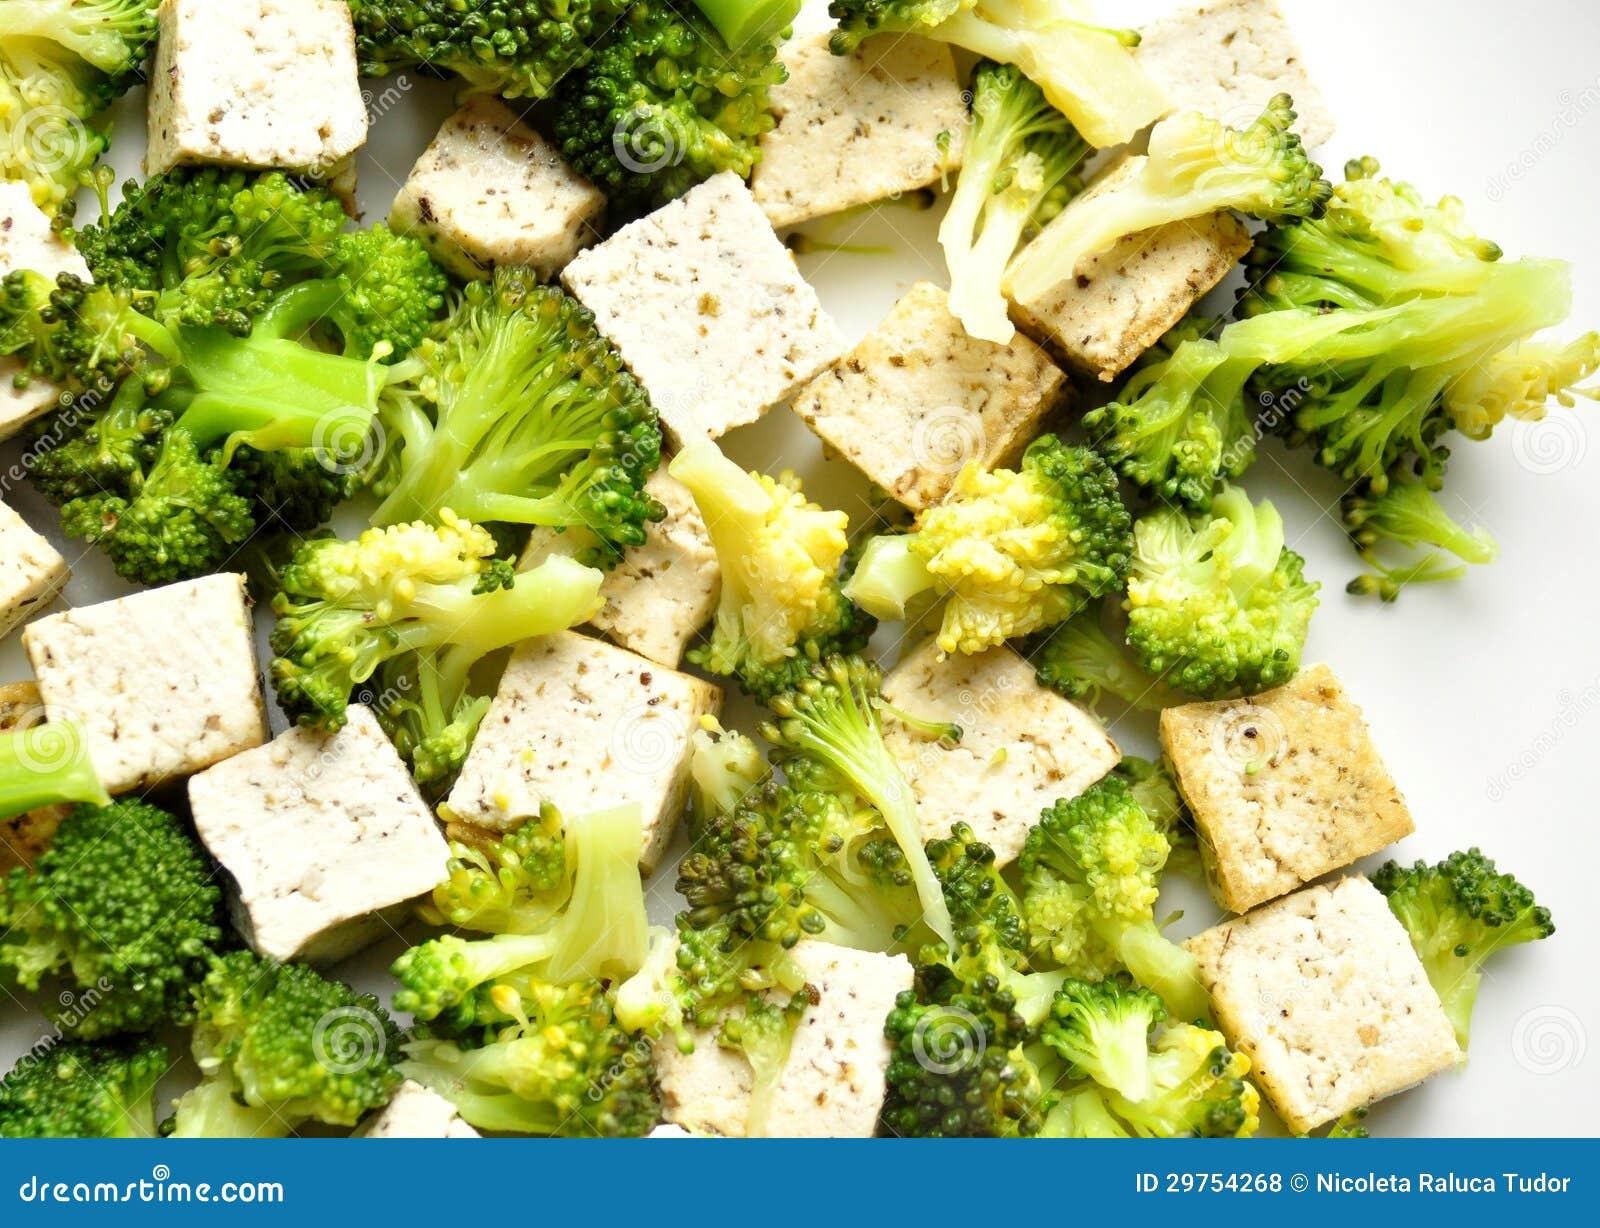 Vegan Food Steamed Broccoli And Tofu Dish Royalty Free